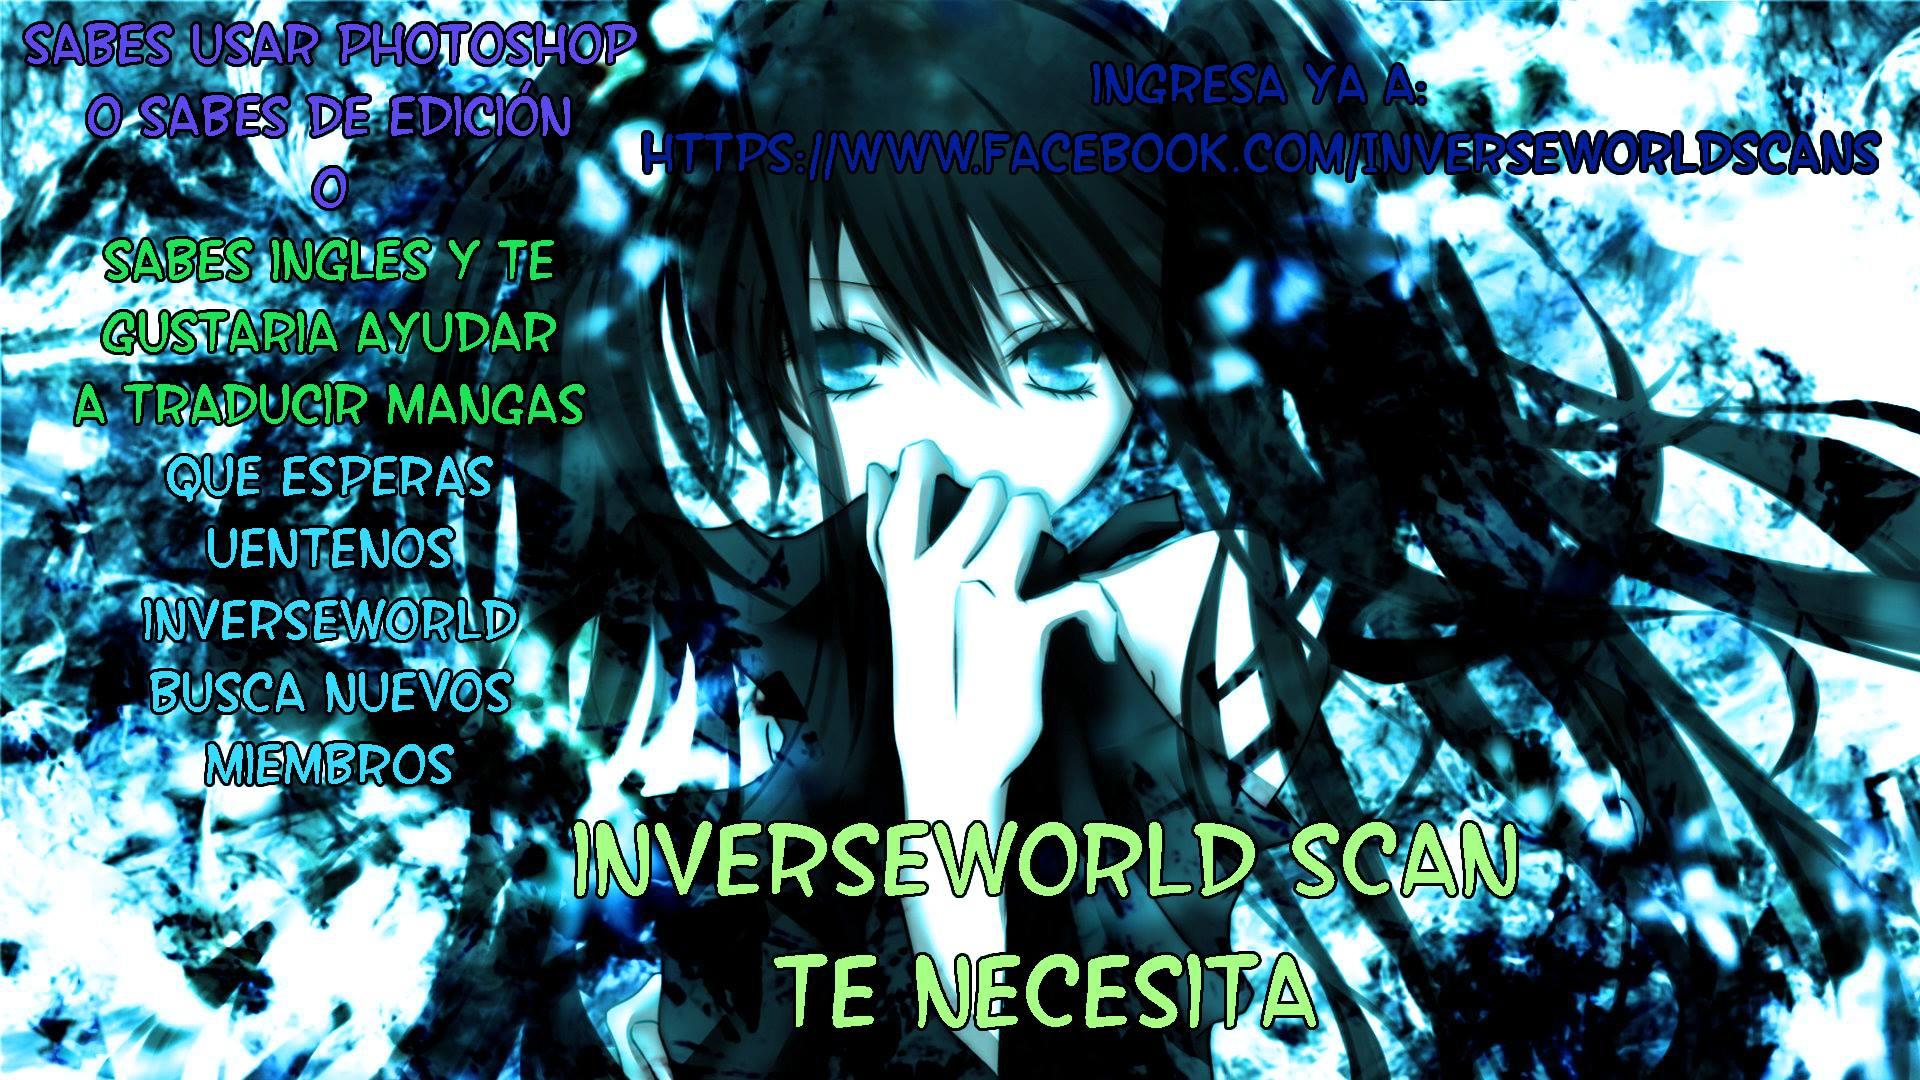 https://c5.mangatag.com/es_manga/18/16210/391366/3d9ca21c6f428bafd84442926c4f7e9c.jpg Page 1